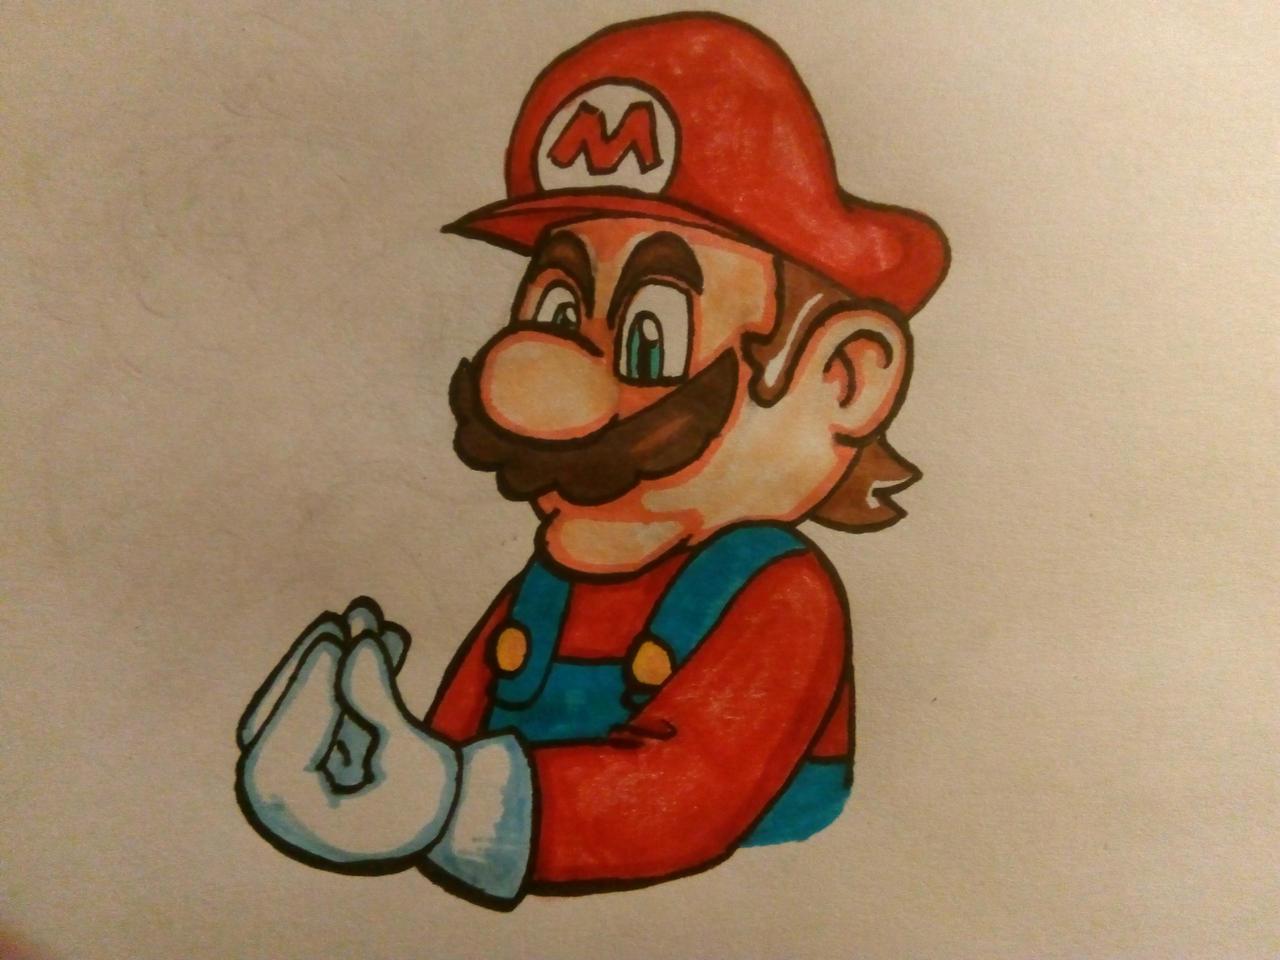 super_mario_italy_hand_thing_meme_by_jul